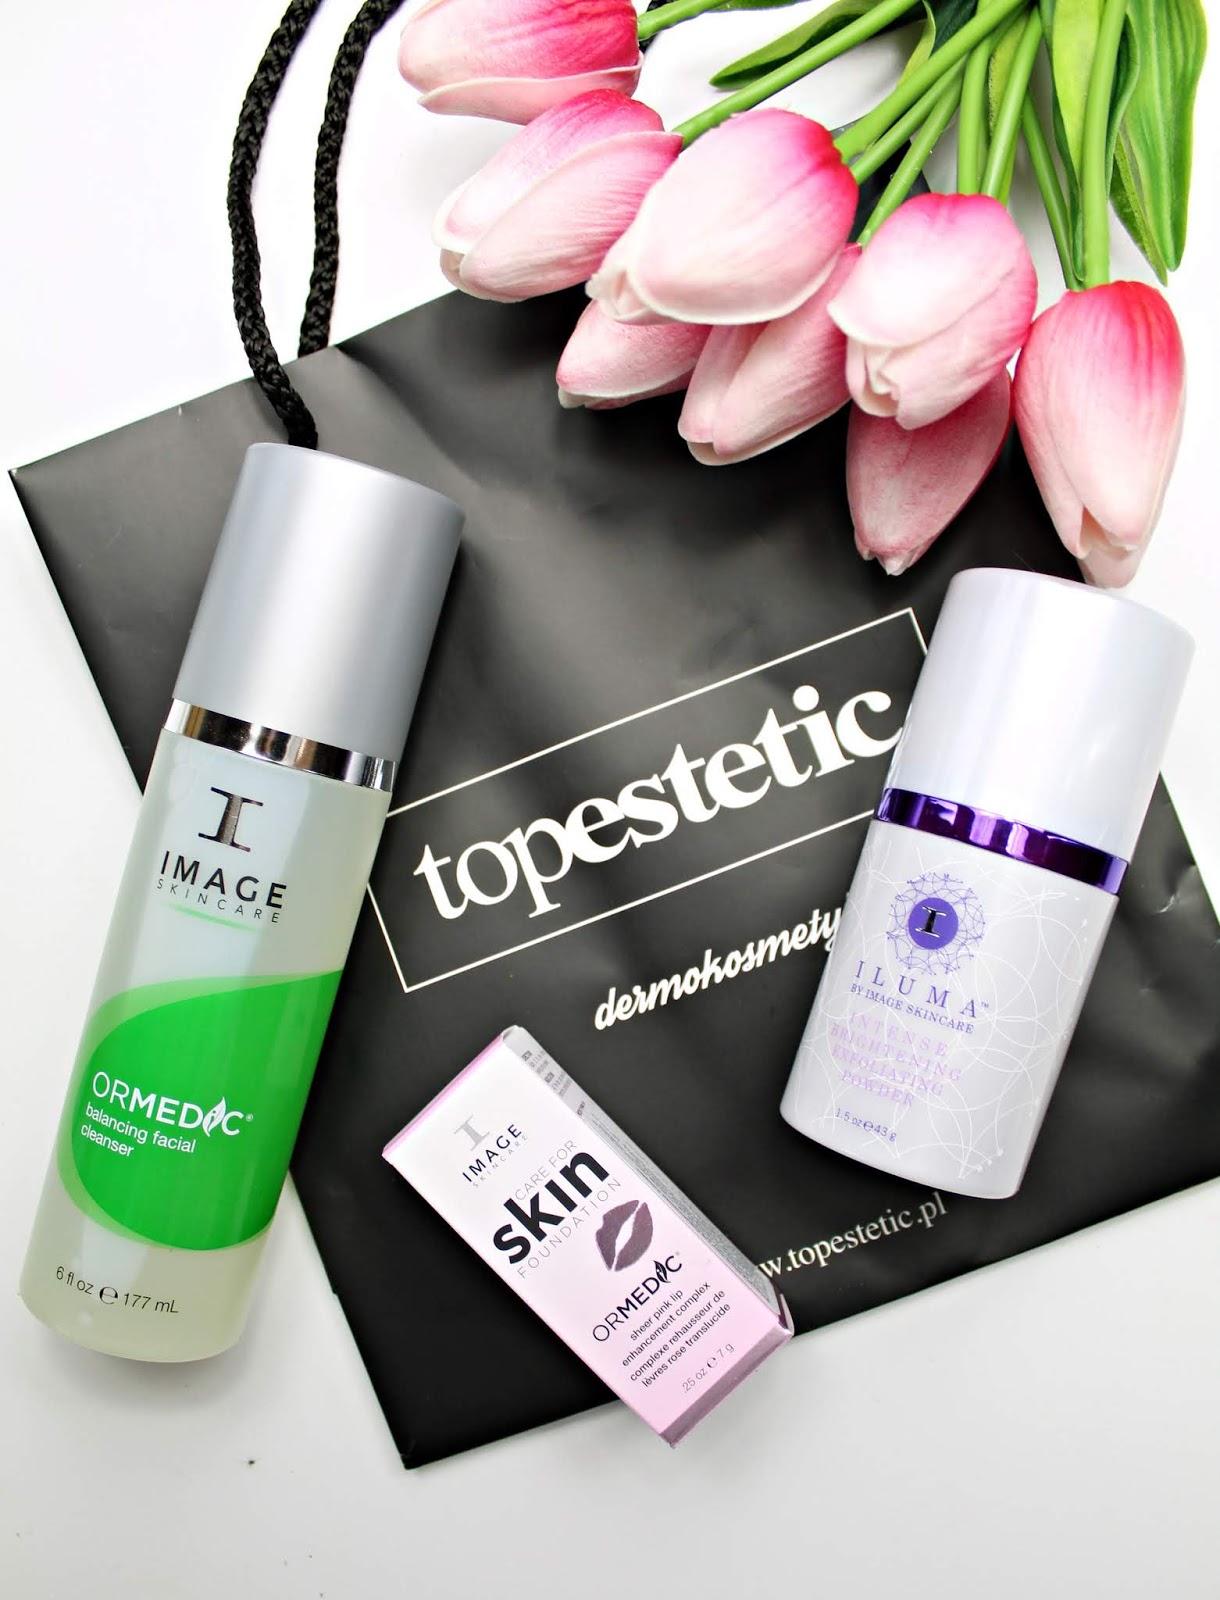 Image Skincare - dermokosmetyki z TOPESTETIC.pl